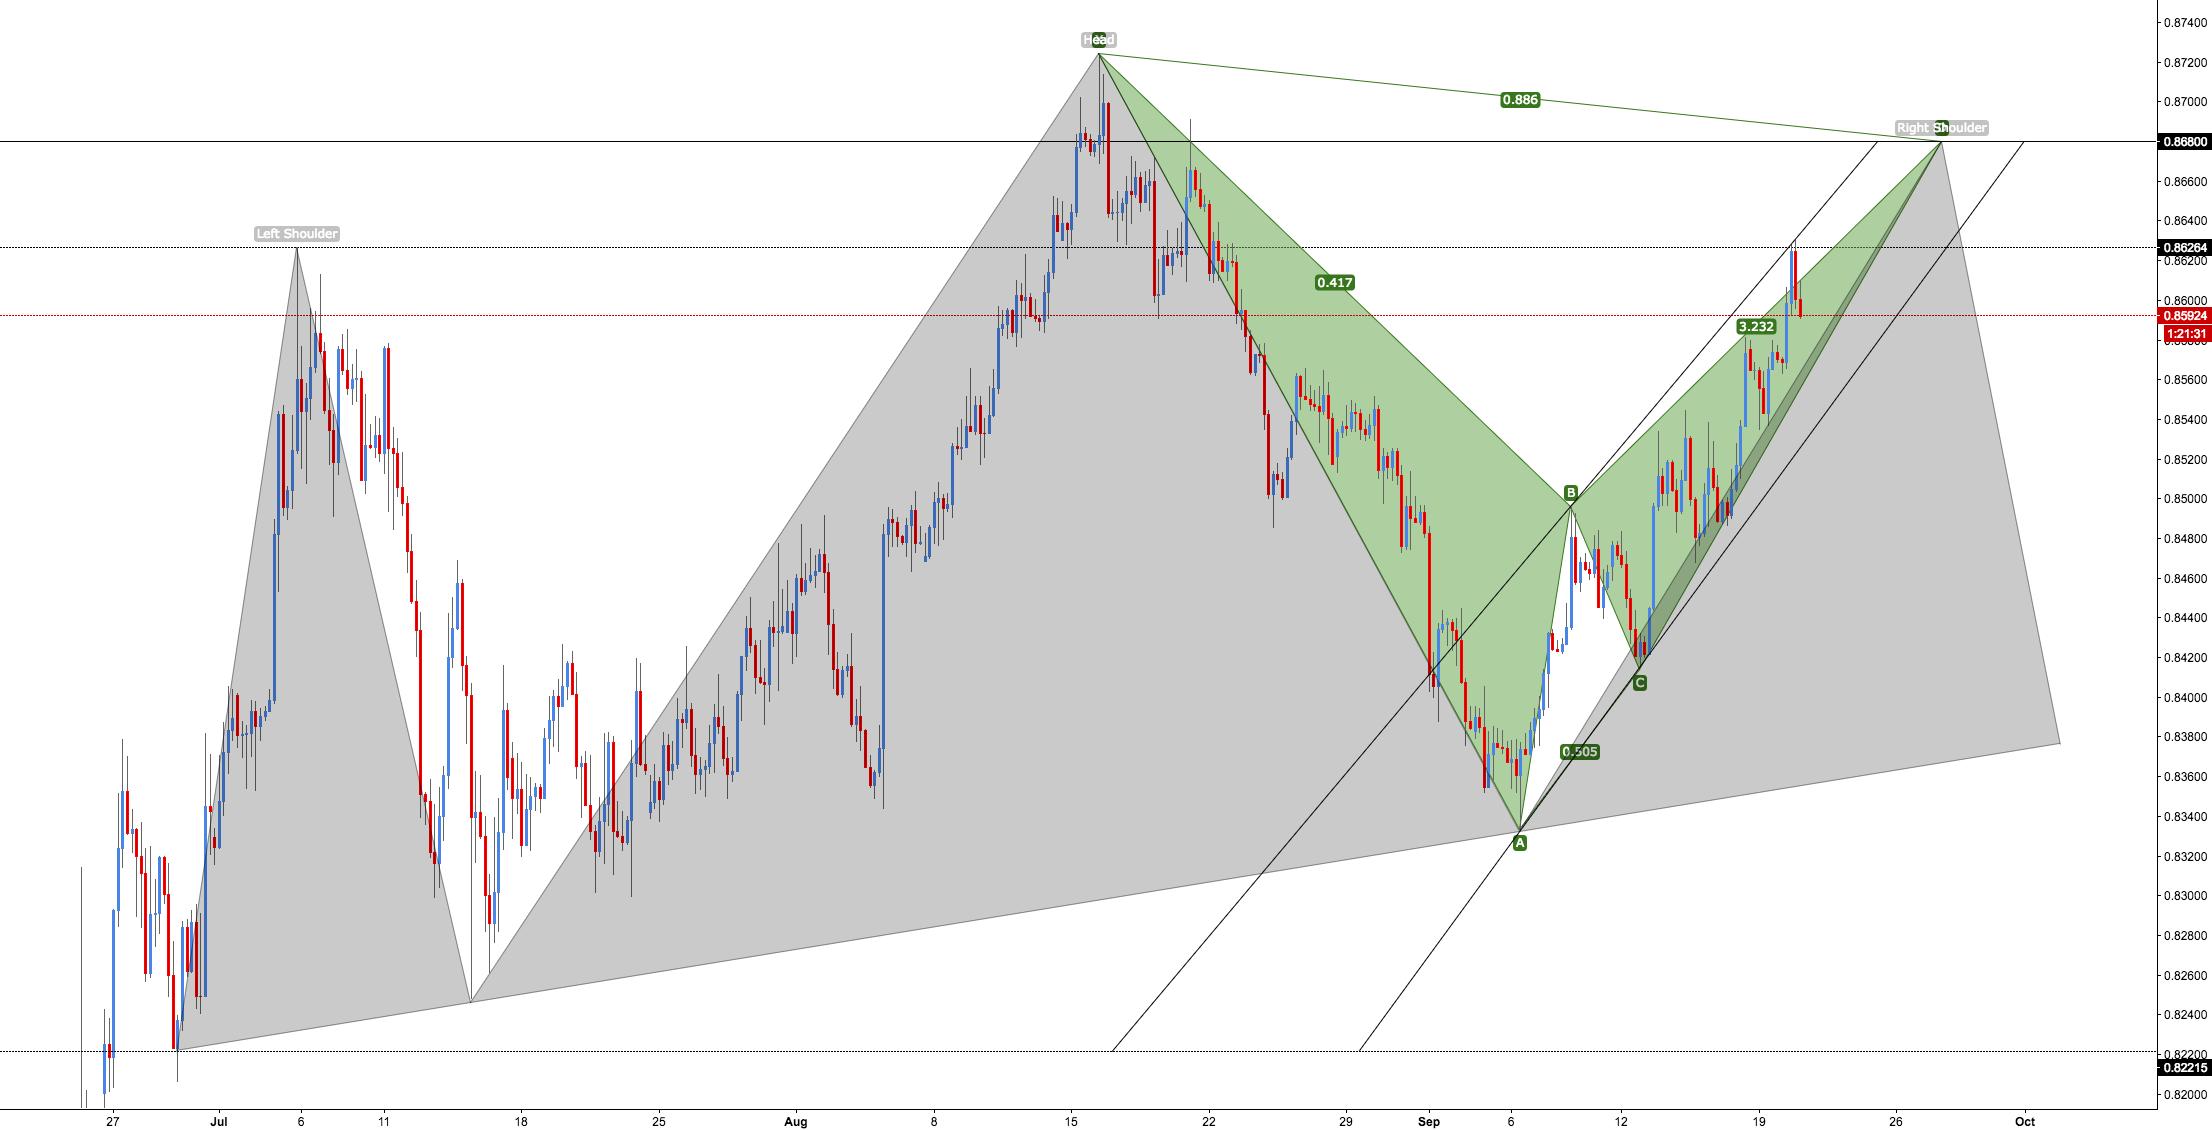 EUR/GBP - Extended Pattern